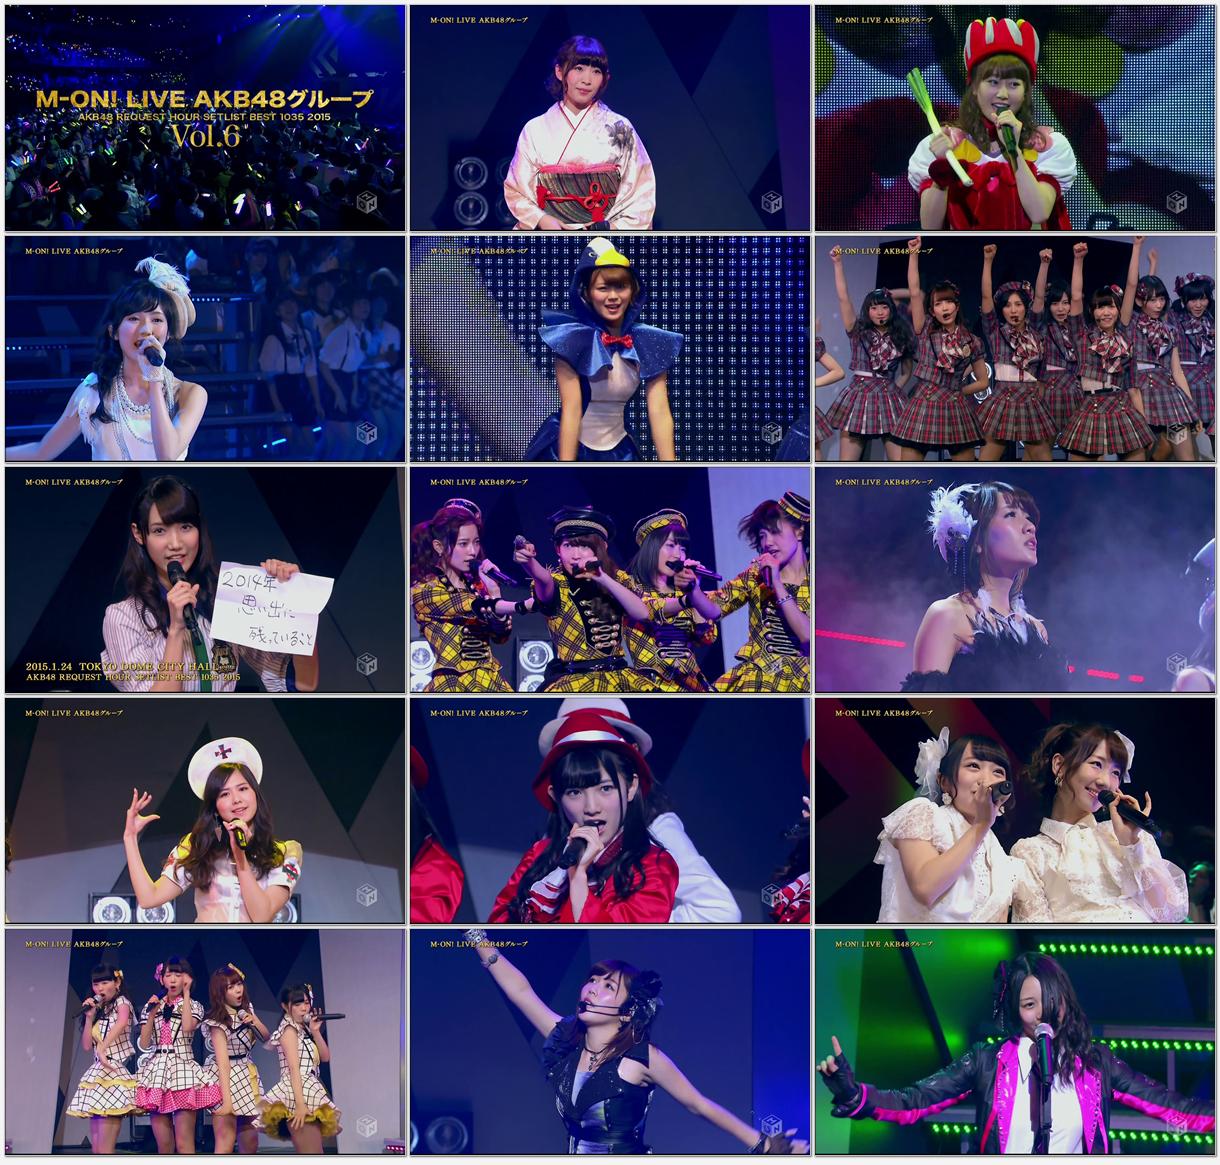 20160411.01 AKB48 - Request Hour Setlist Best 1035 2015 Vol. 6 (HDTV 2016.04.03) (JPOP.ru).jpg